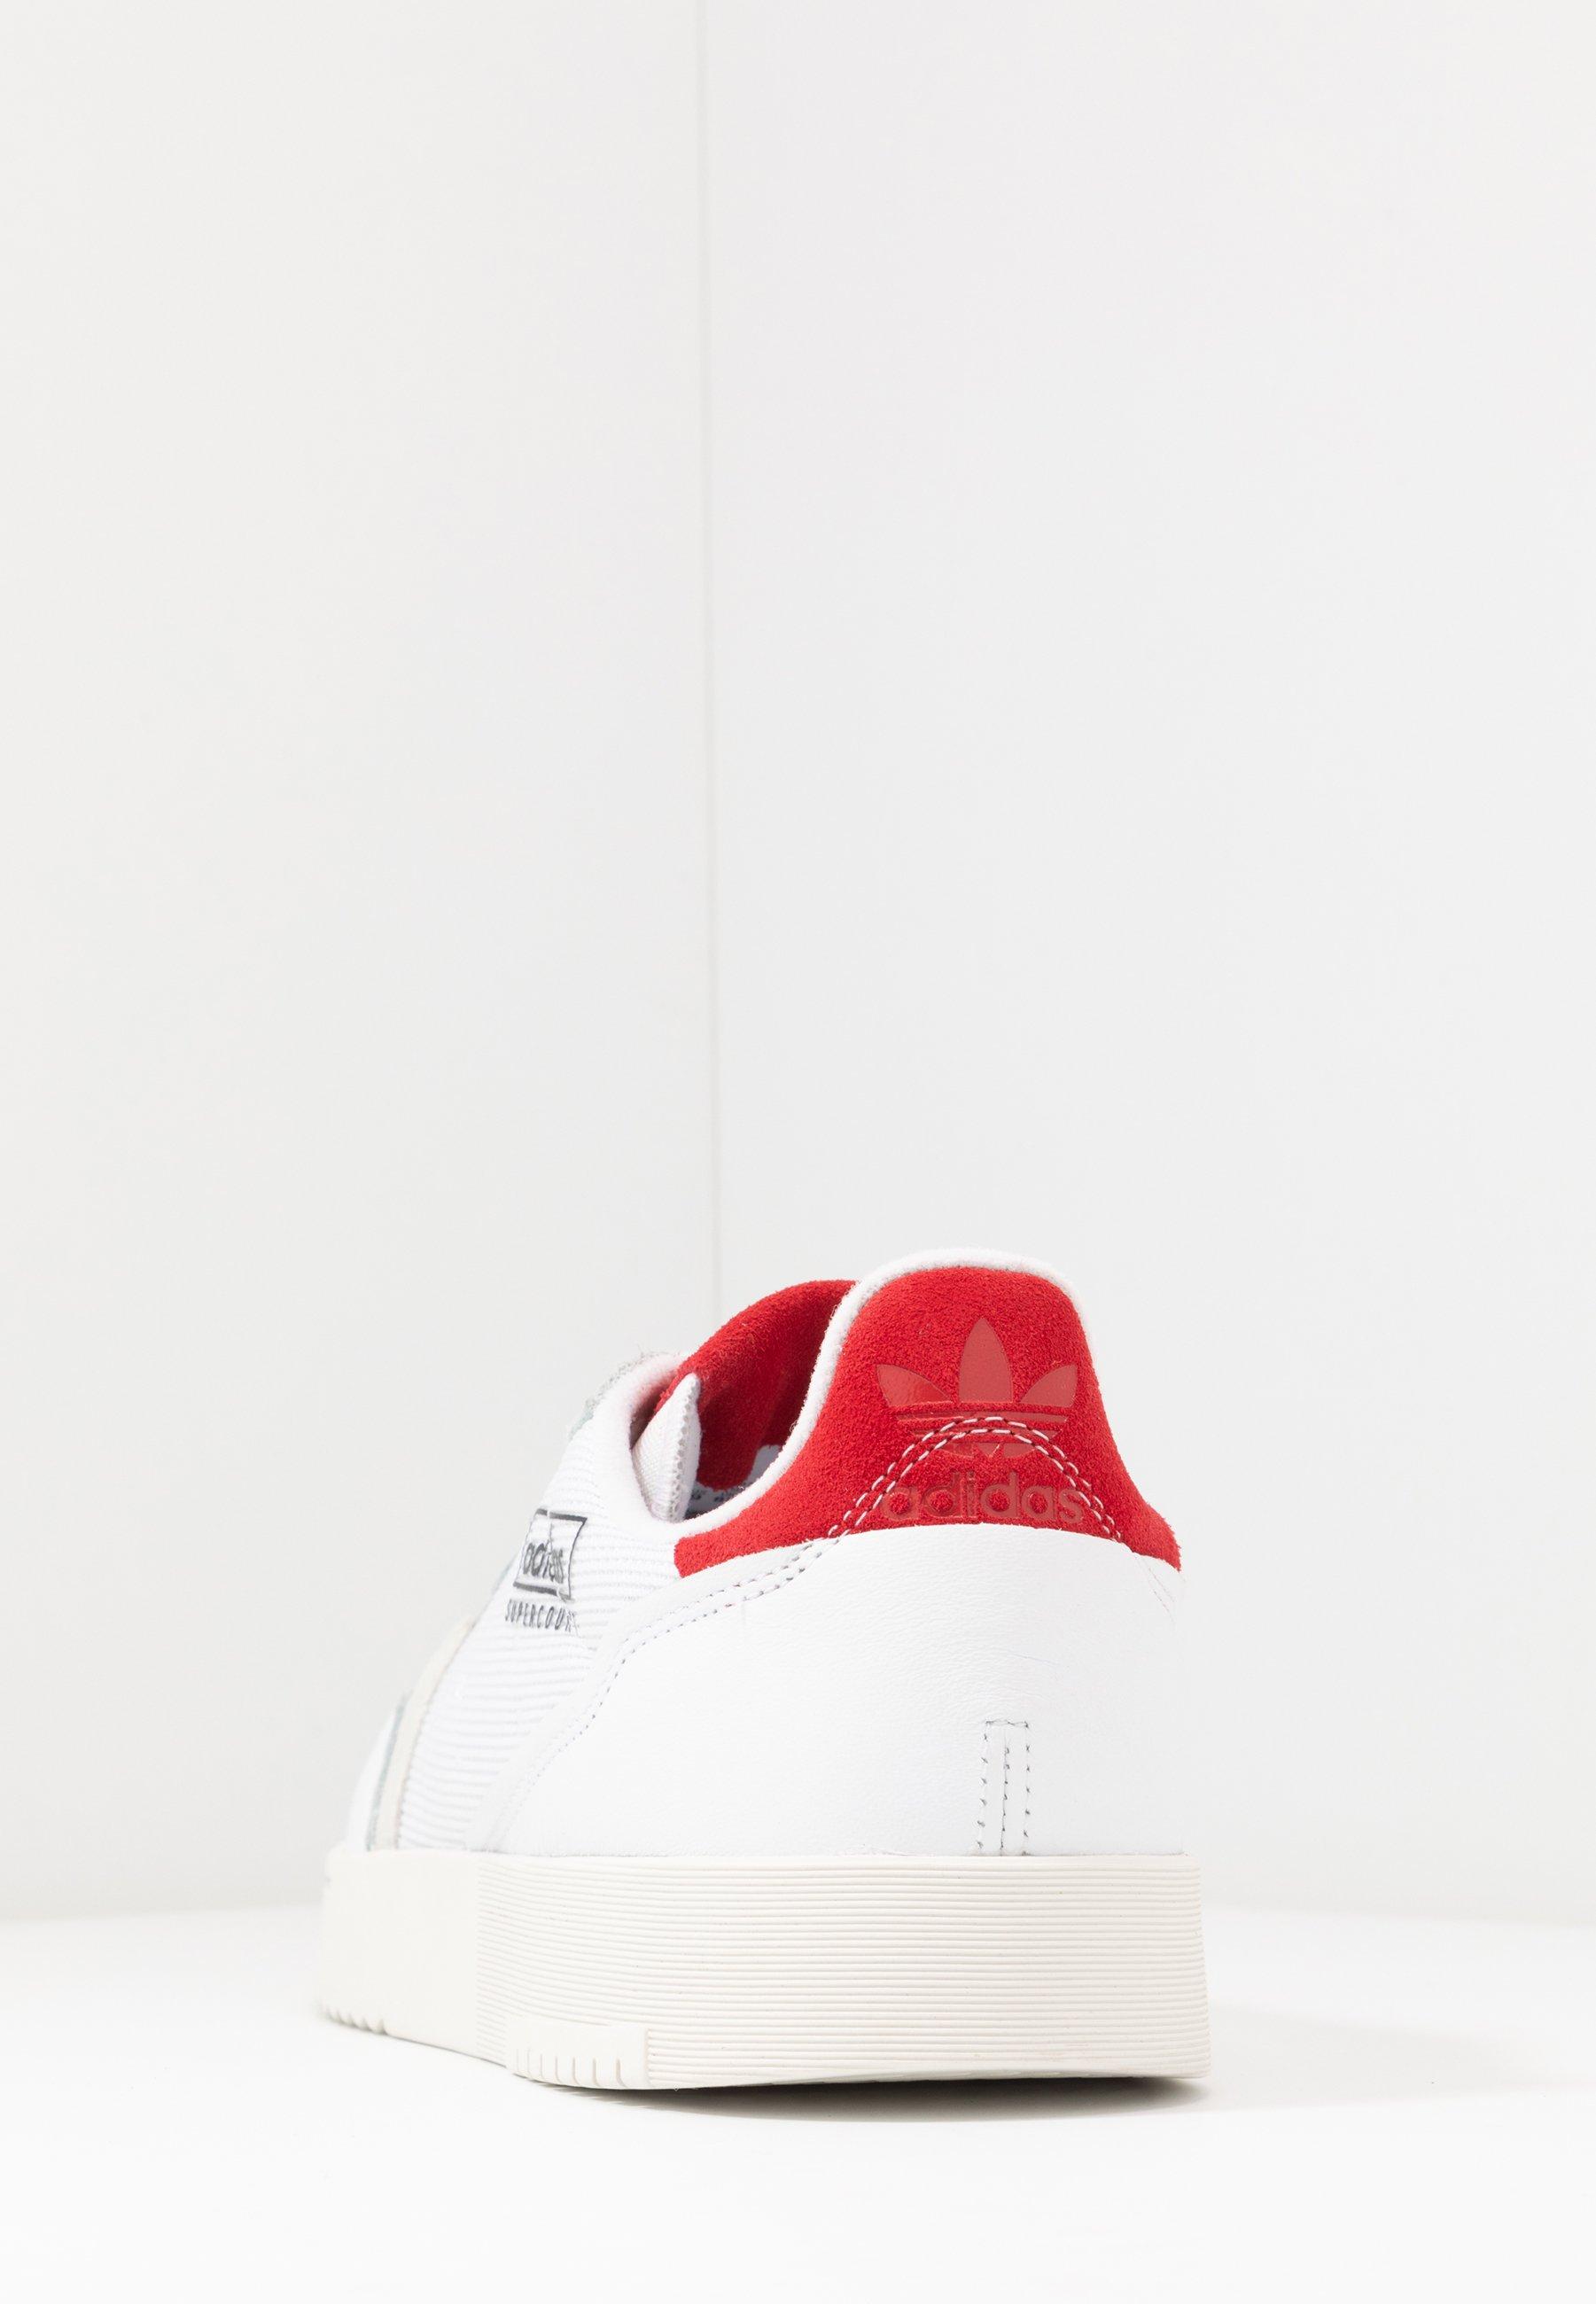 Adidas Originals Supercourt - Sneakers Laag Footwear White/scarlet Goedkope Schoenen